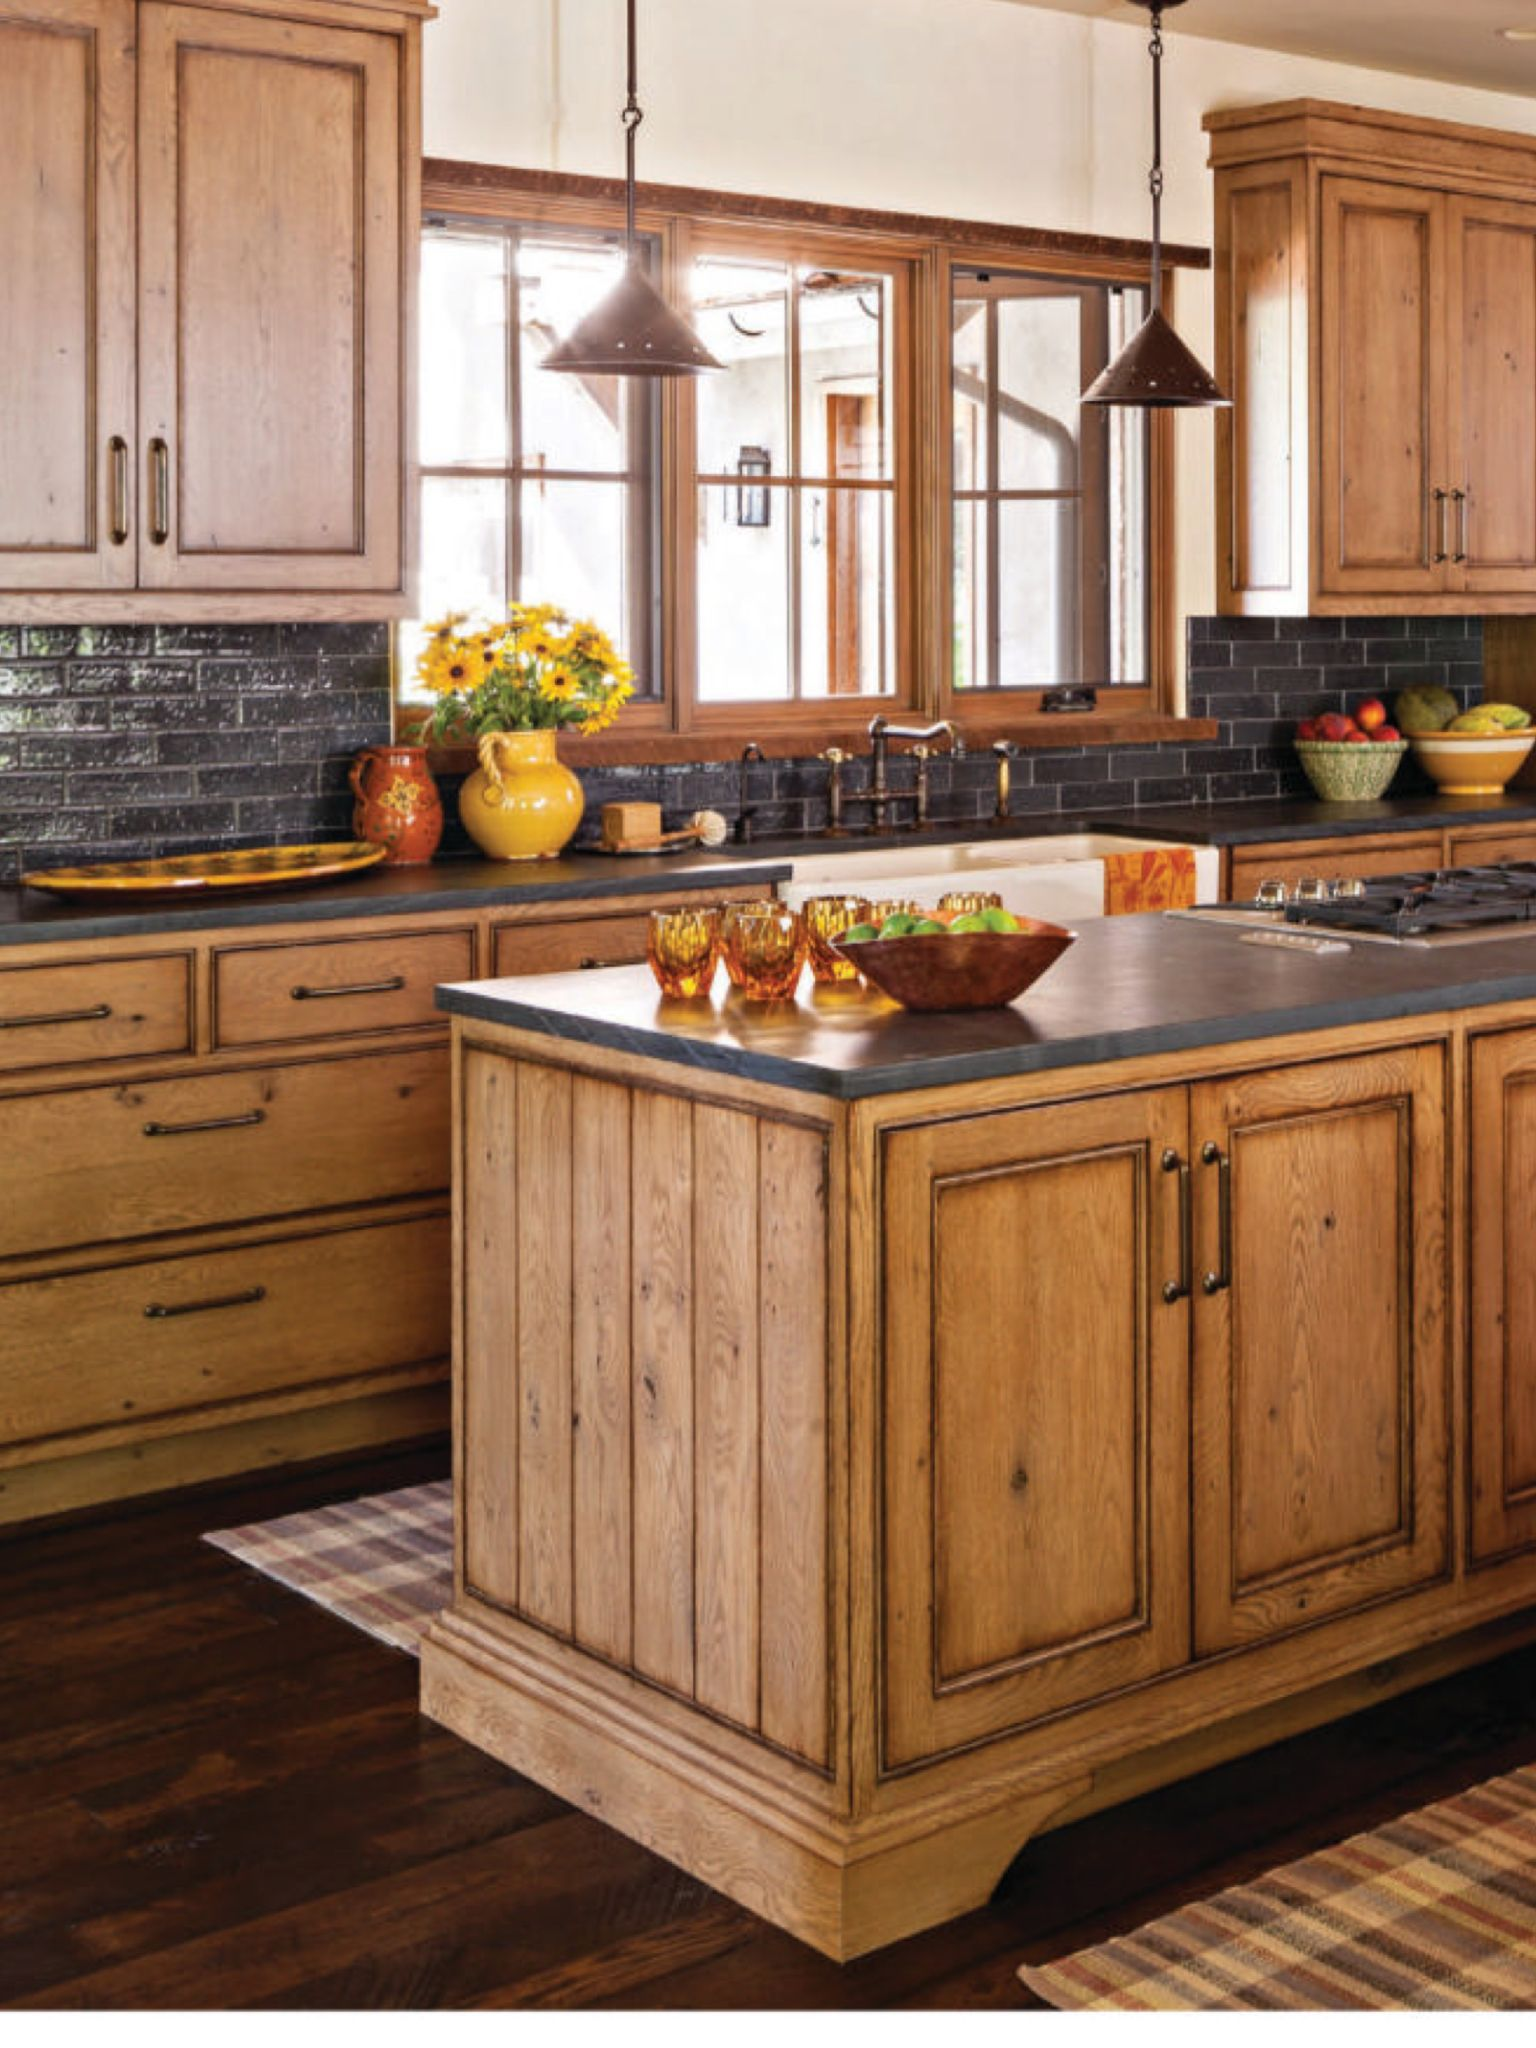 glazed tile backsplash and black countertops updated kitchen kitchen island table black on kitchen decor black countertop id=57501